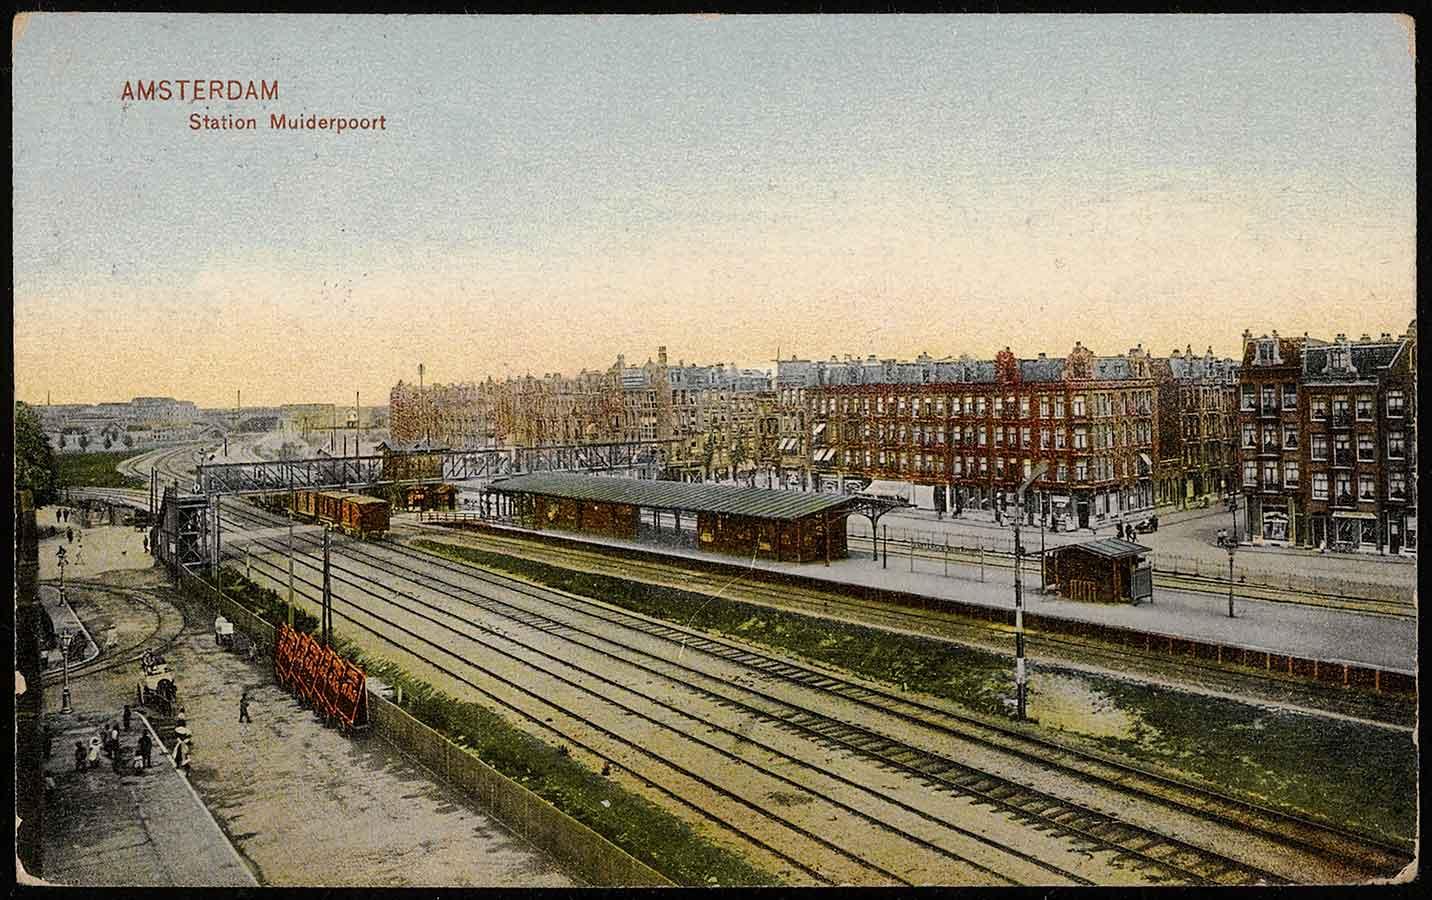 Ansichtkaart met tekening oude Muiderpoortstation vanuit hoogpunt gezien. Met rechts ingang Balistraat